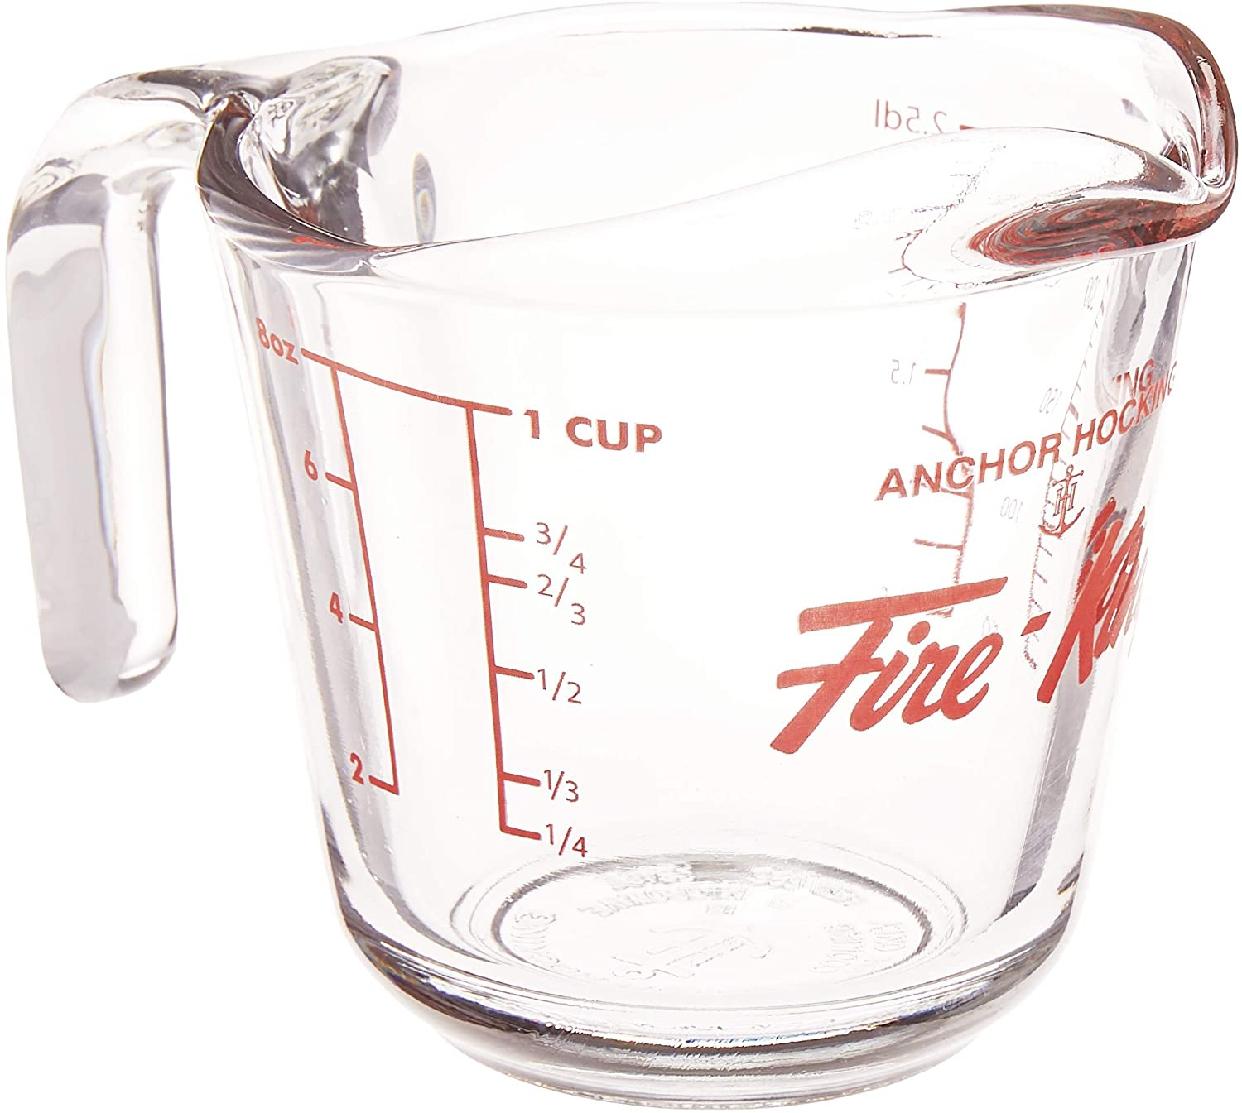 Fire King(ファイヤーキング) メジャリングカップ 250mlの商品画像